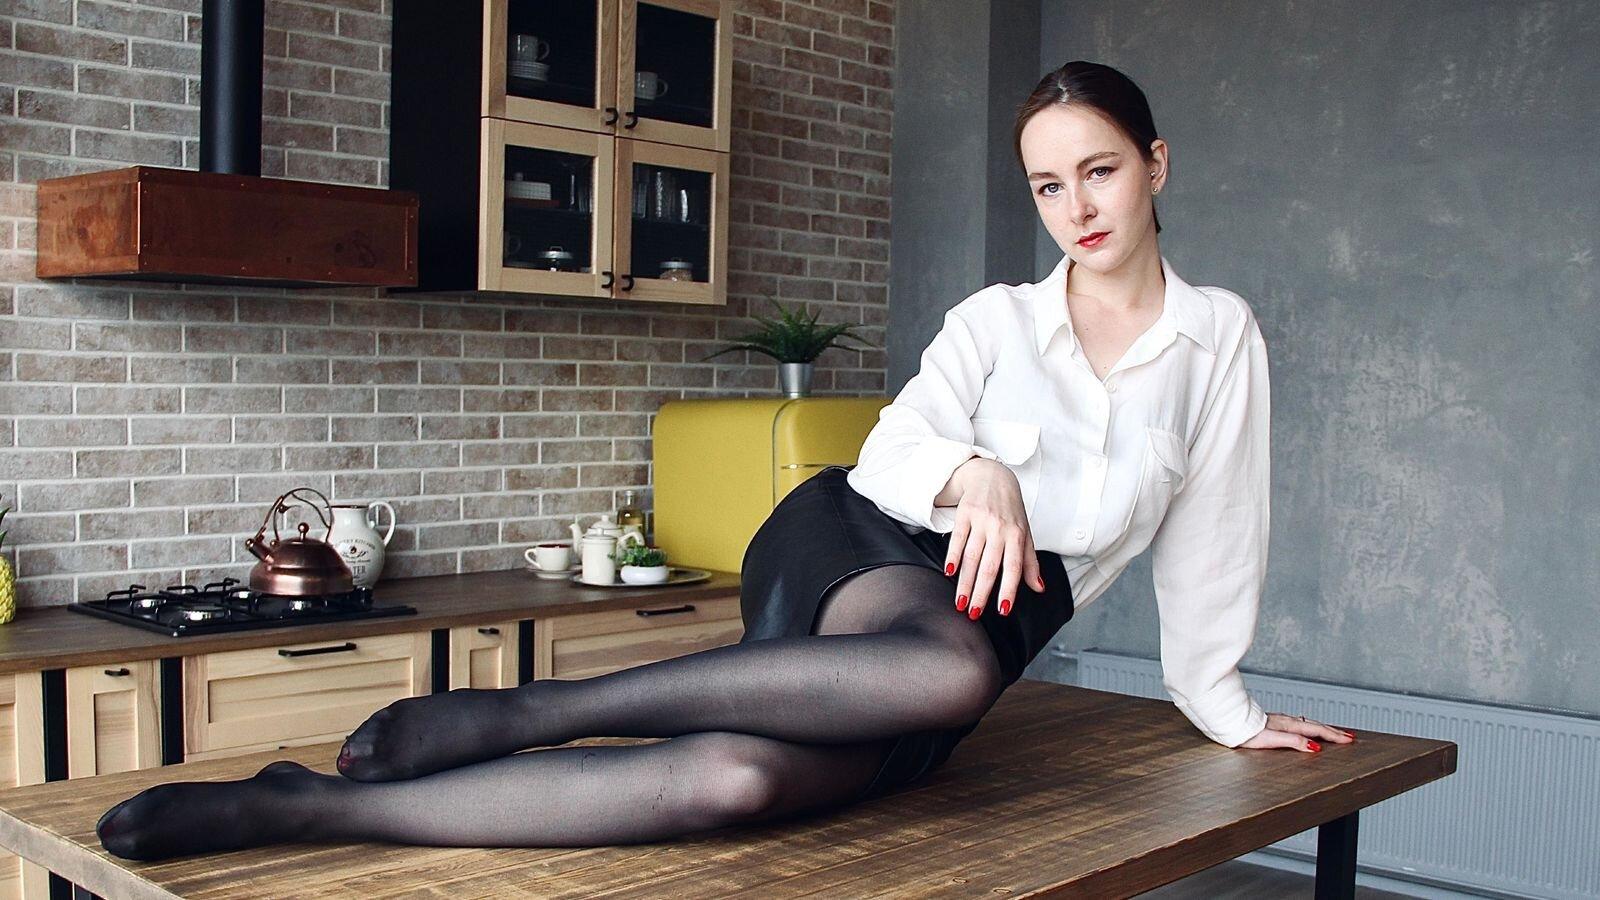 CharlotteKerry